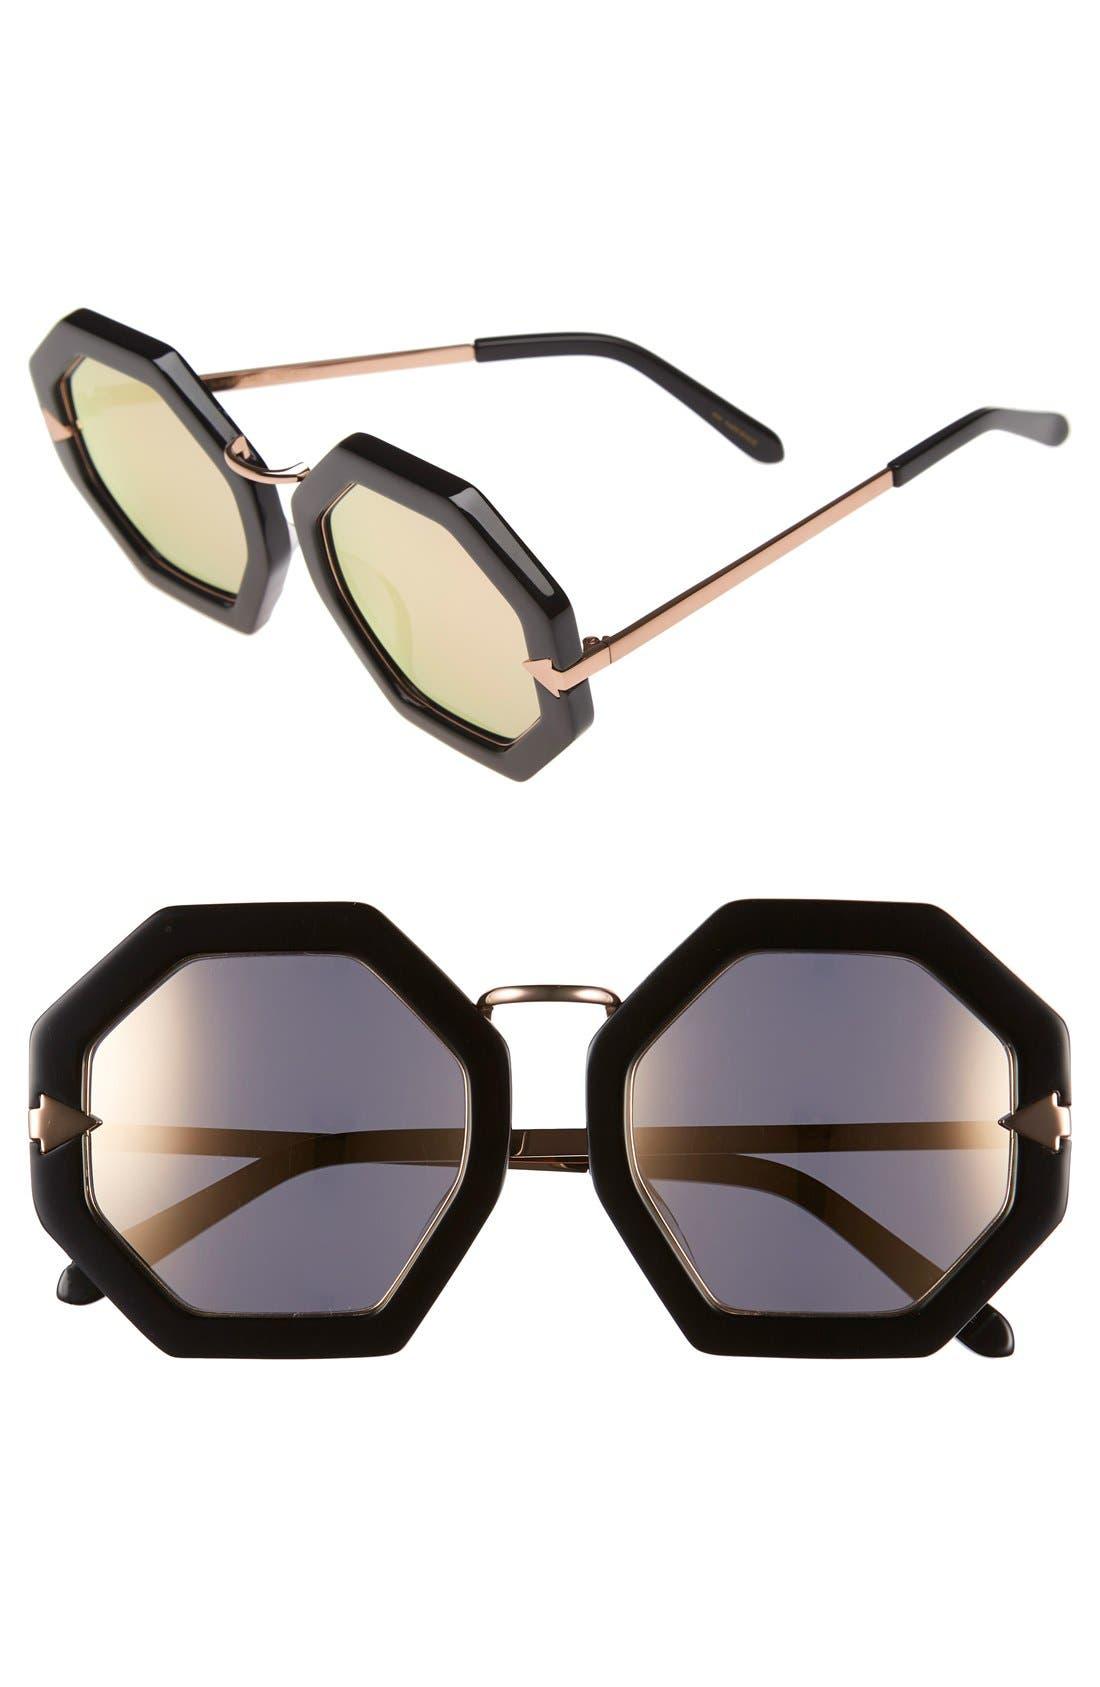 Main Image - Karen Walker 'Moon Disco' 53mm Sunglasses